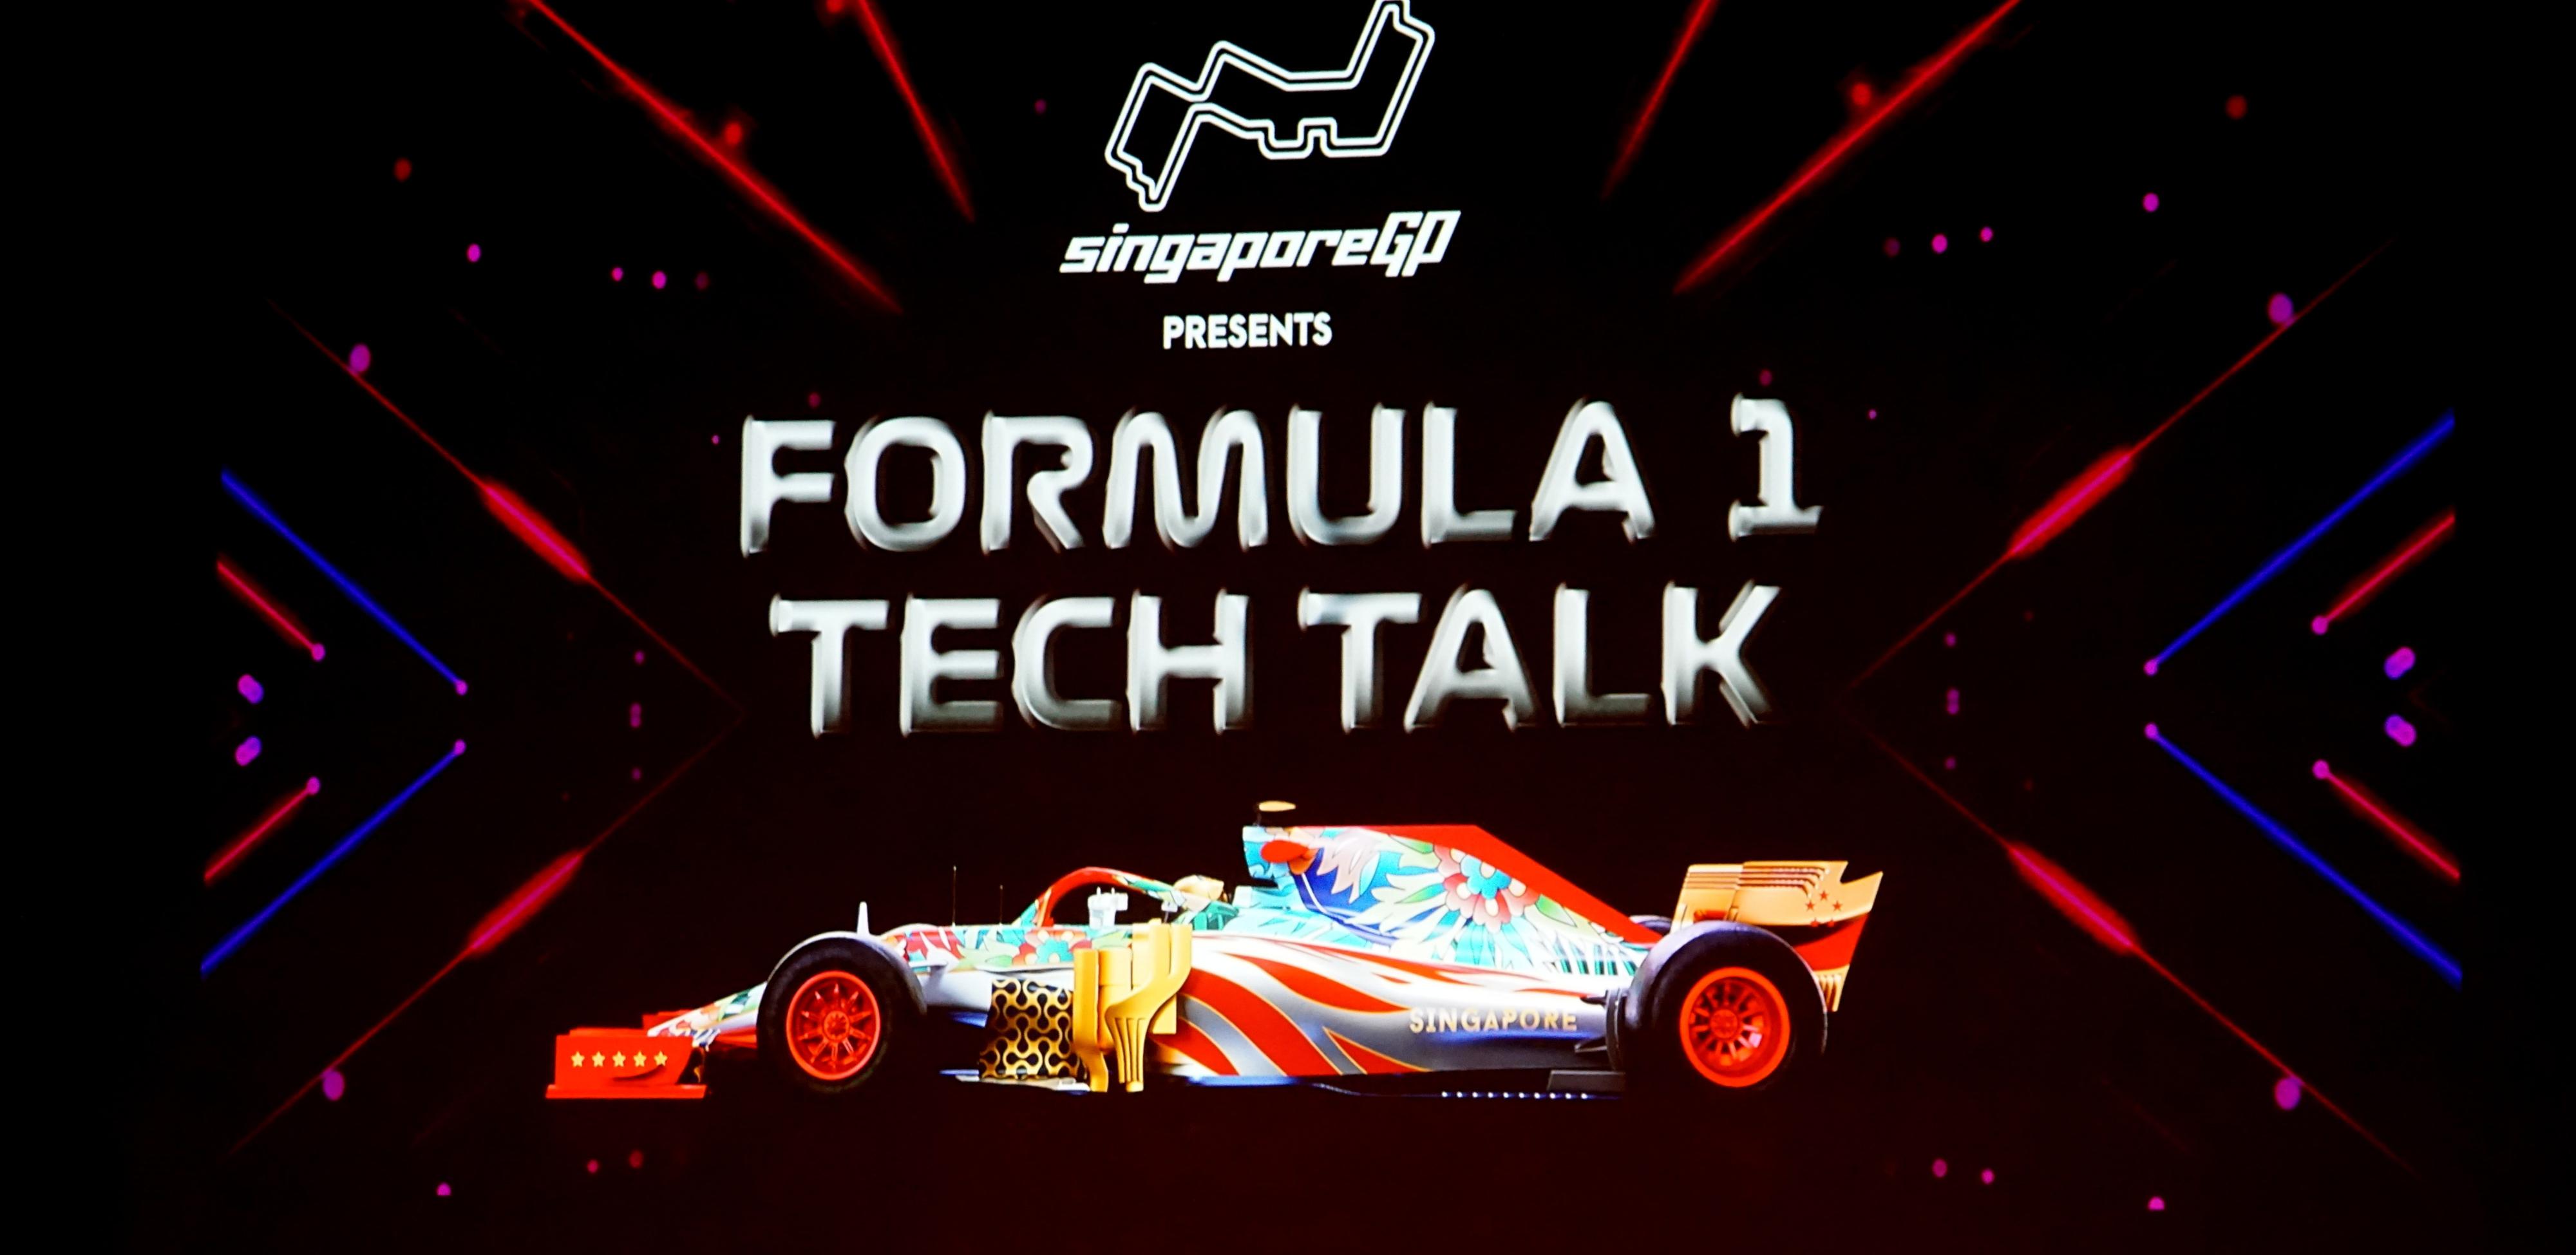 formula 1 tech talk